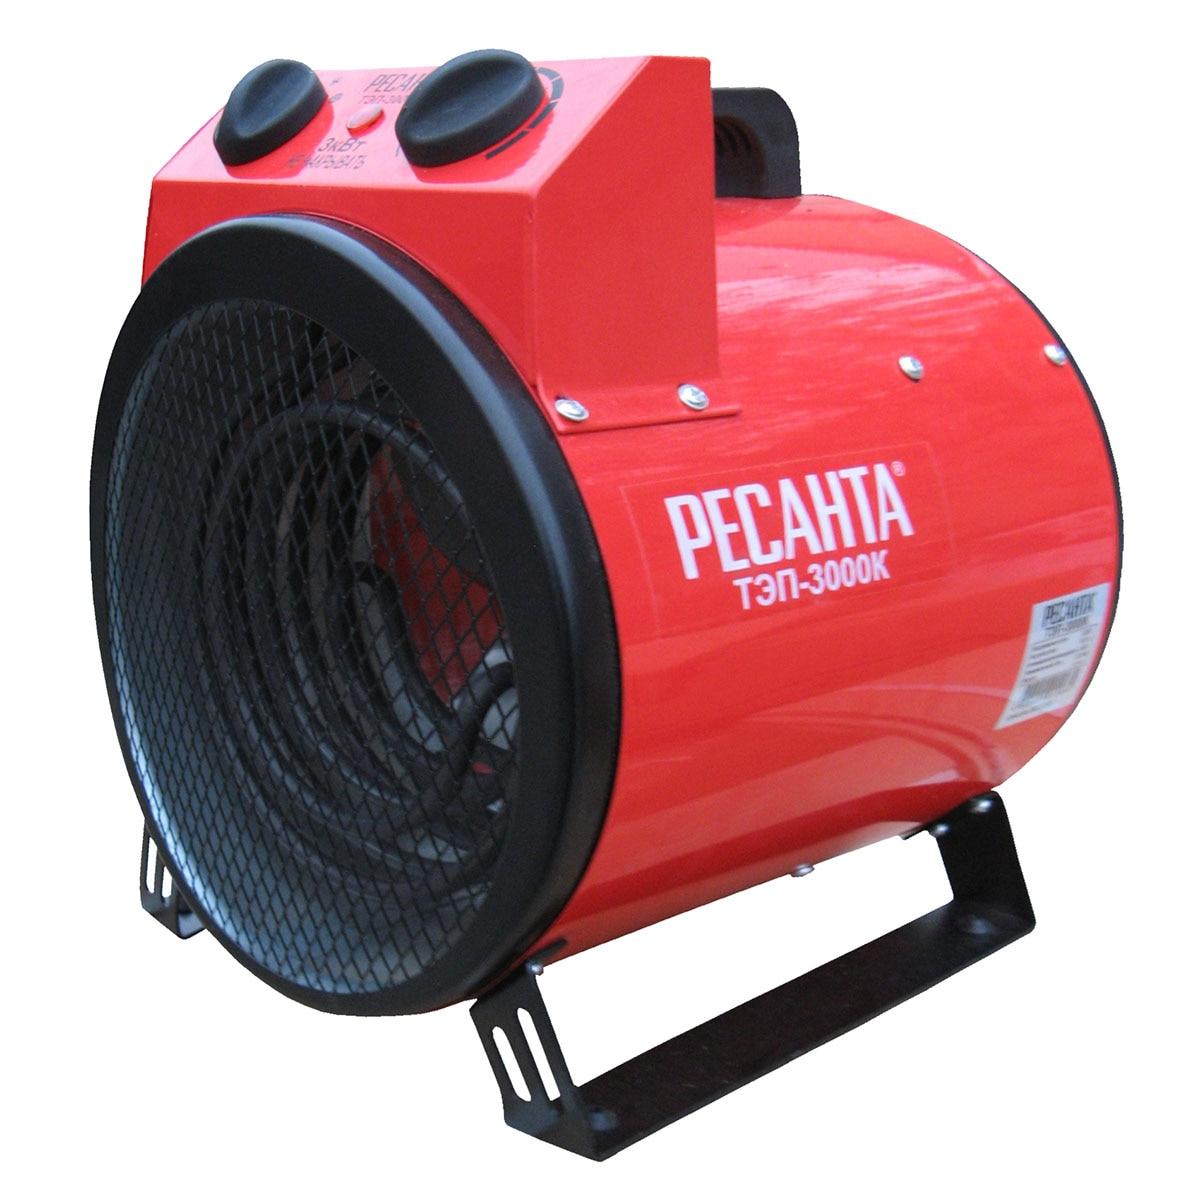 Electric heat gun Resanta TEP-3000K